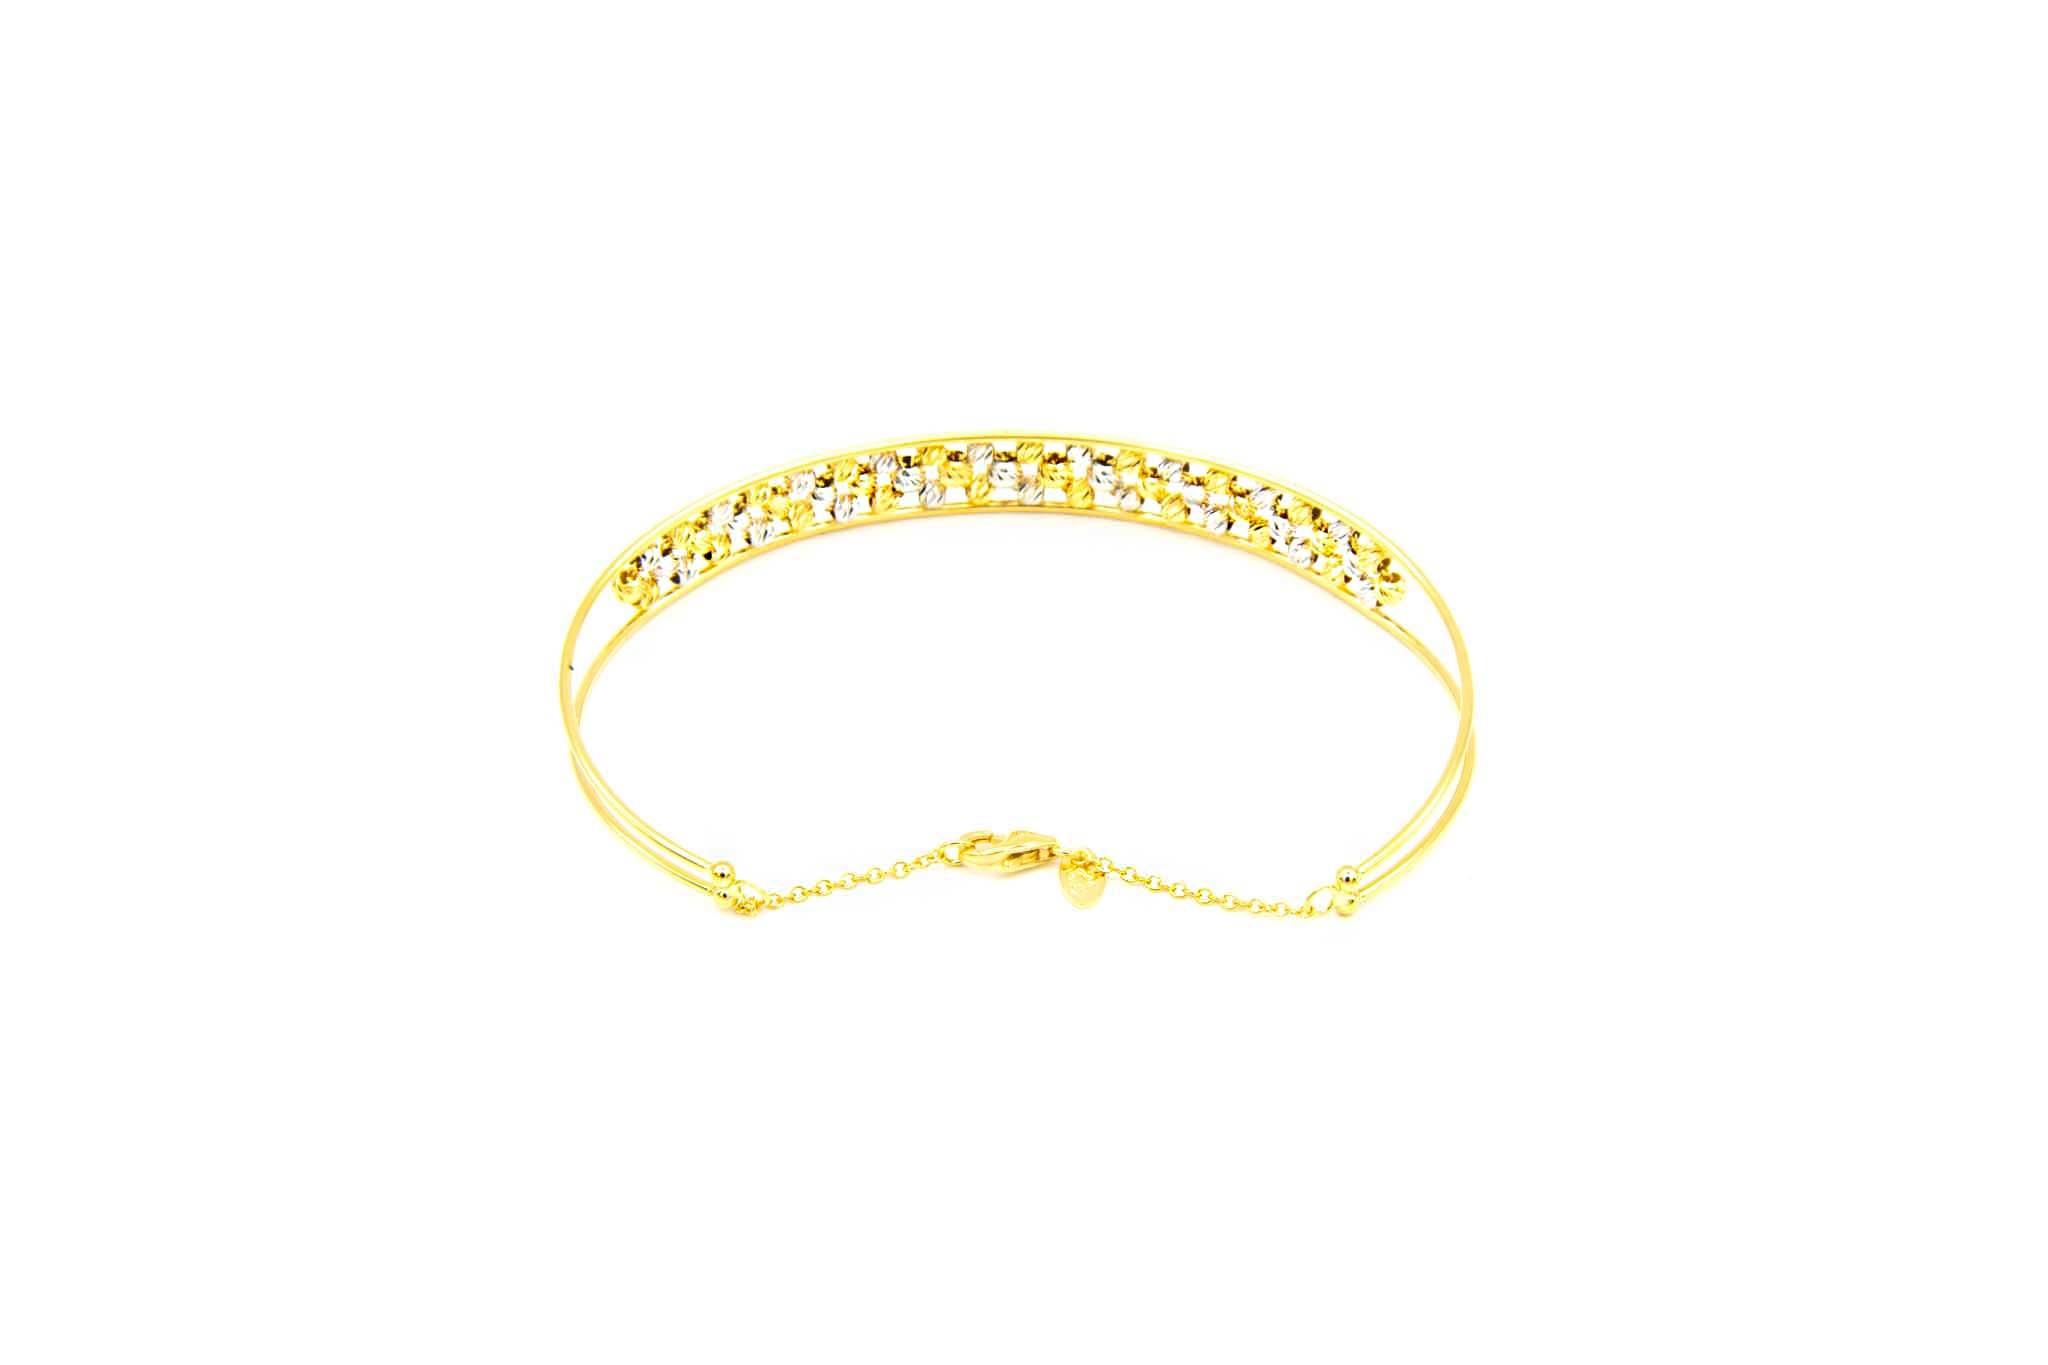 Armband opengewerkte band gevuld met diamond cut balletjes-6